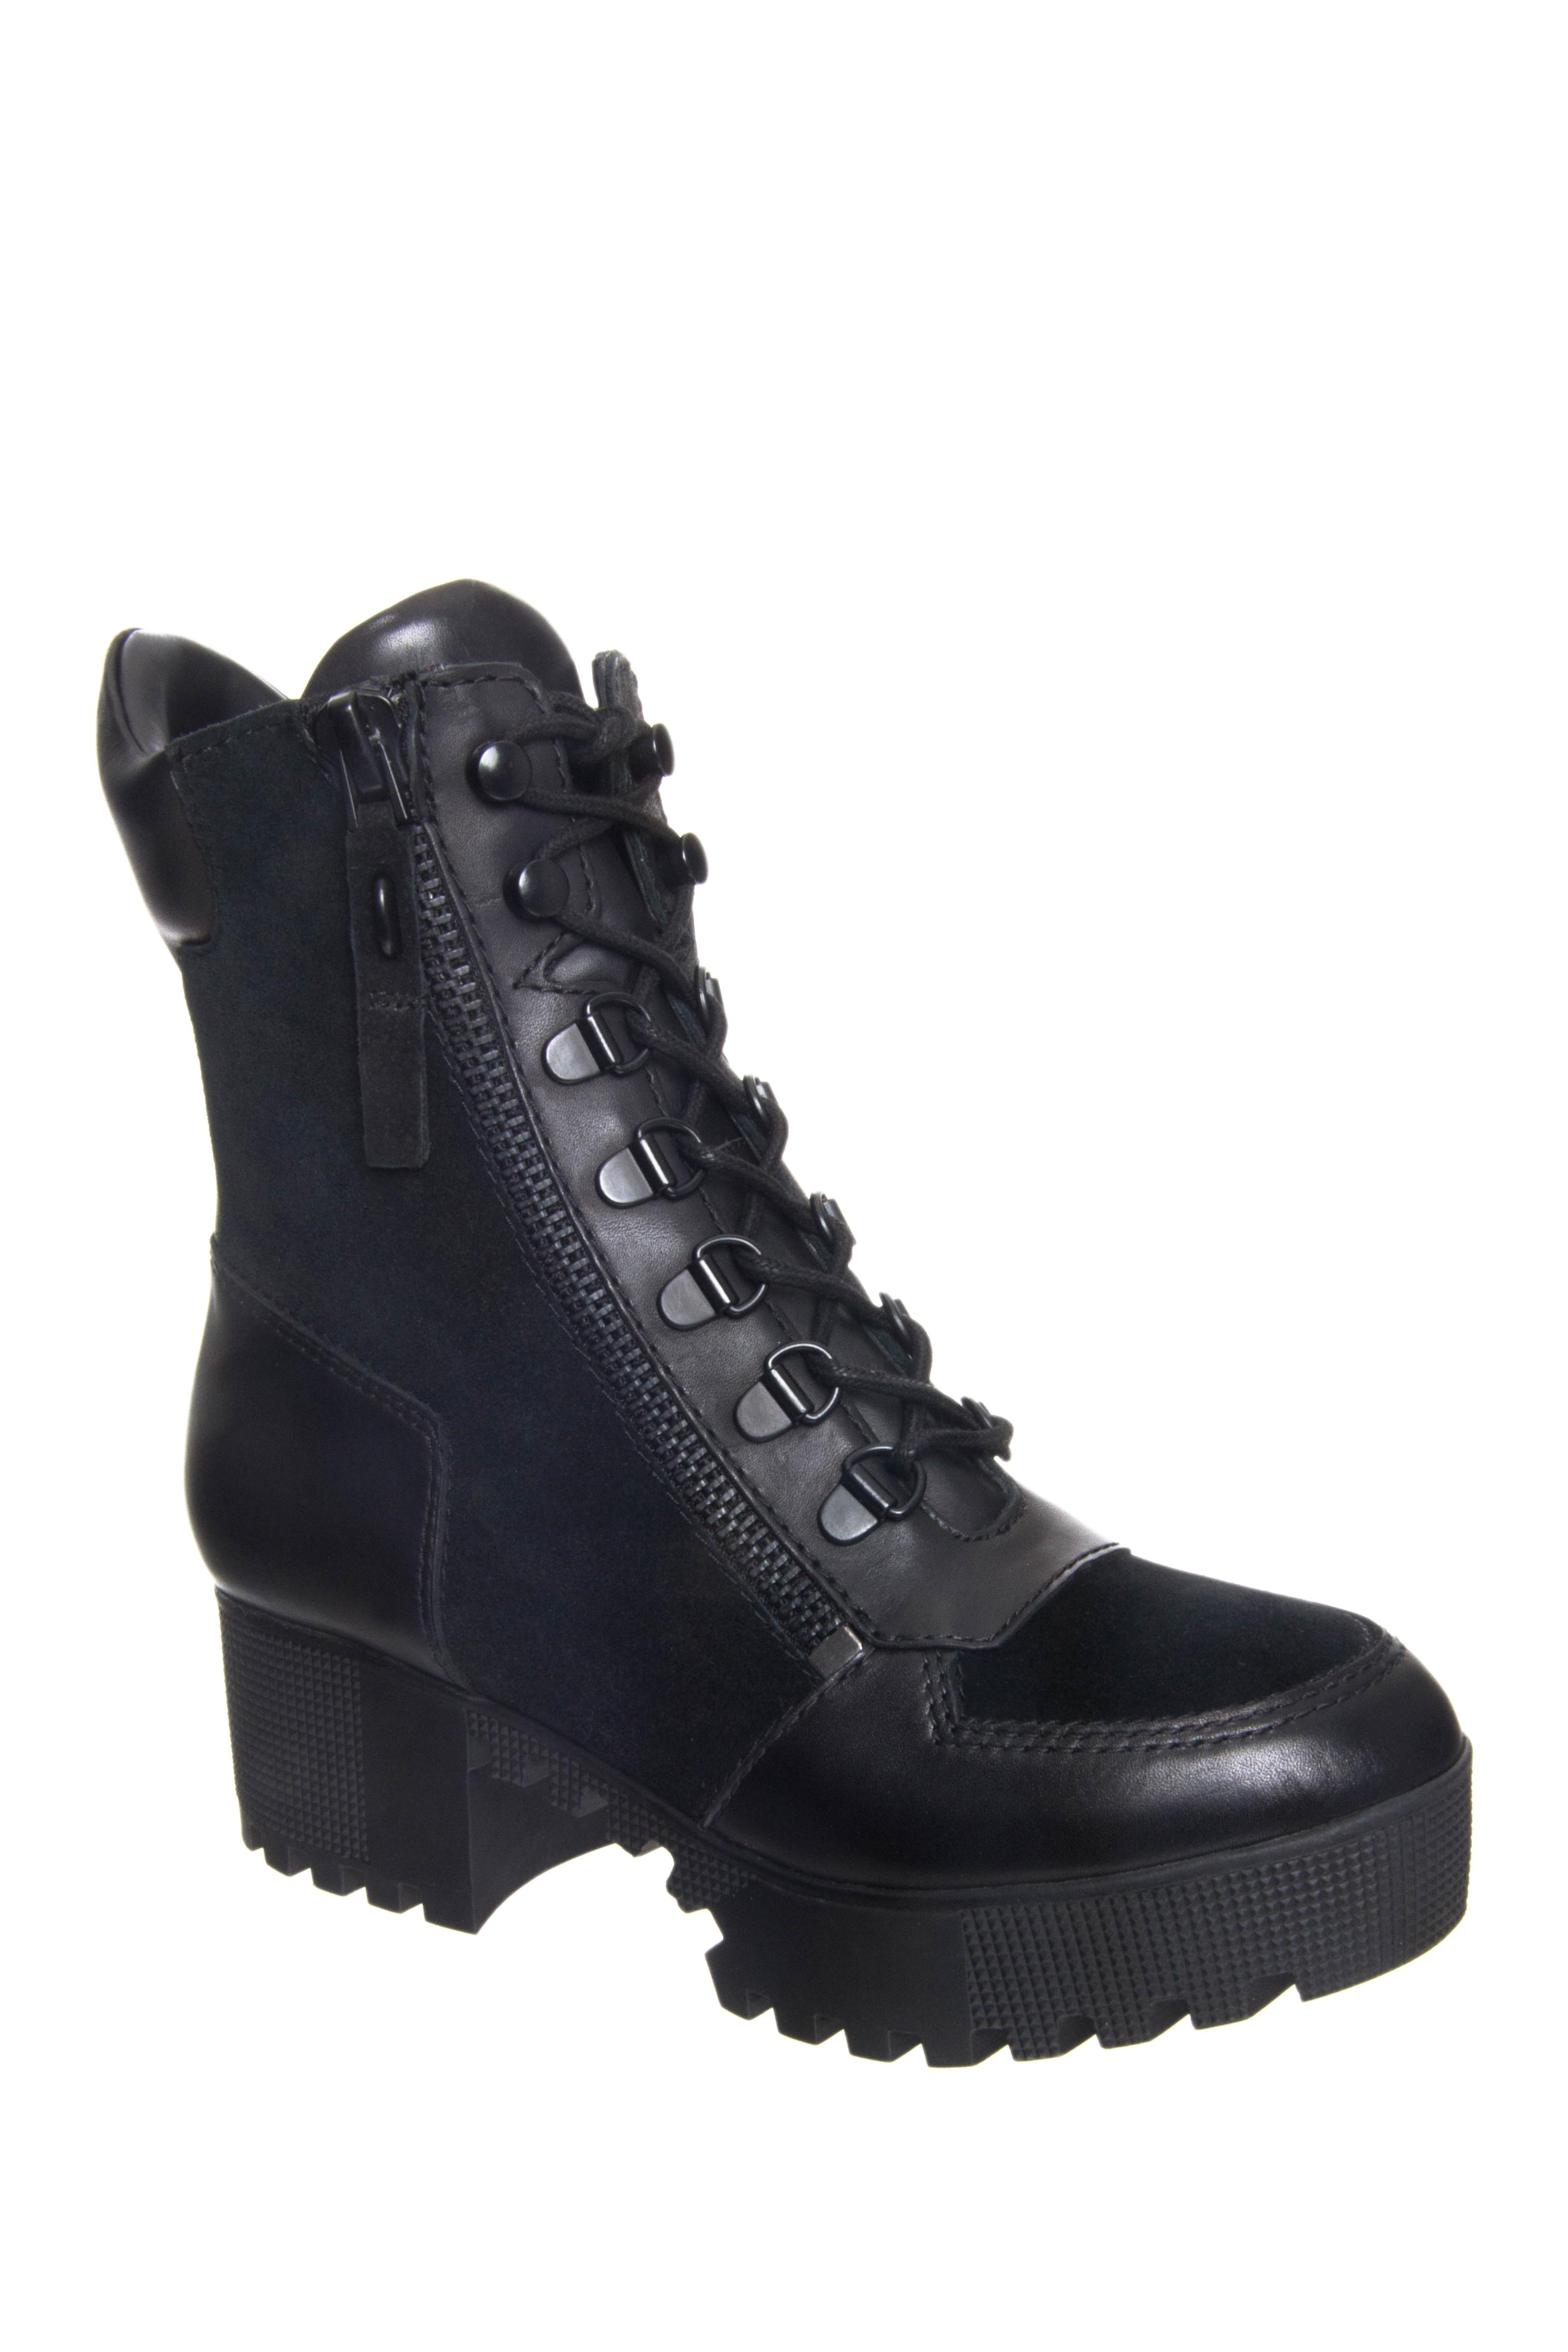 Kendall + Kylie Phoenix Mid Heel Boots - Black